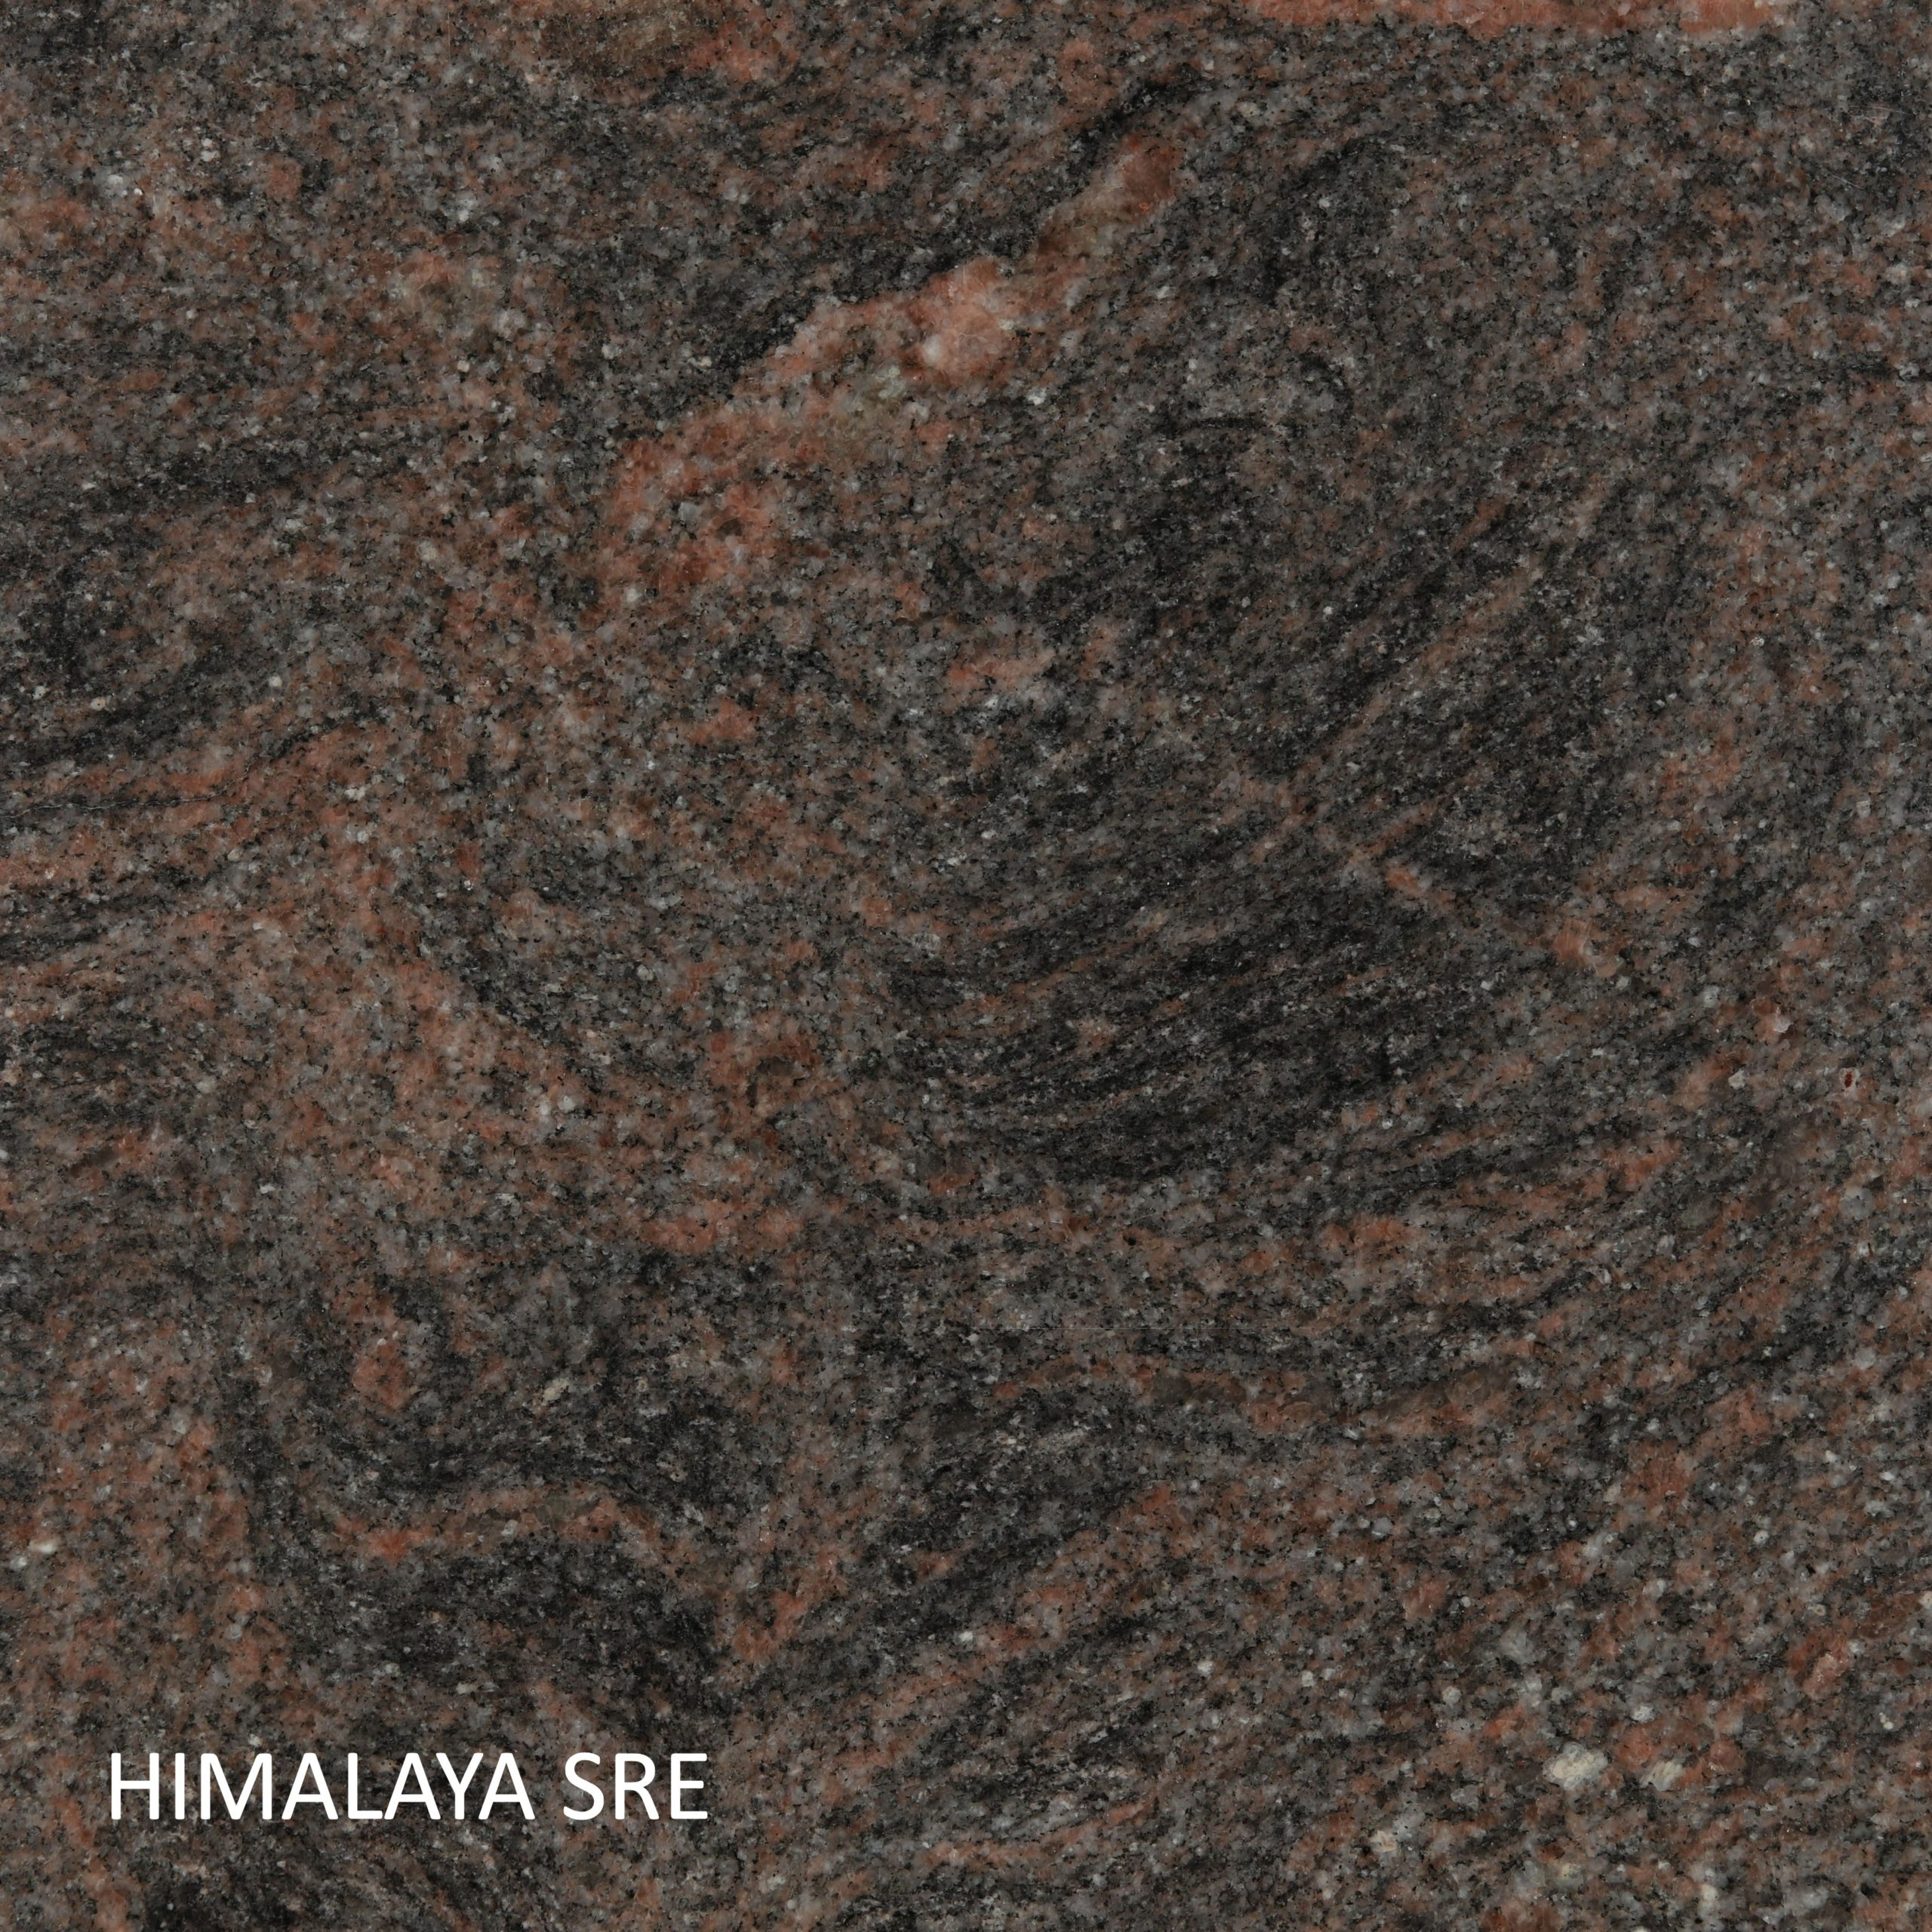 Himalaya-SRE